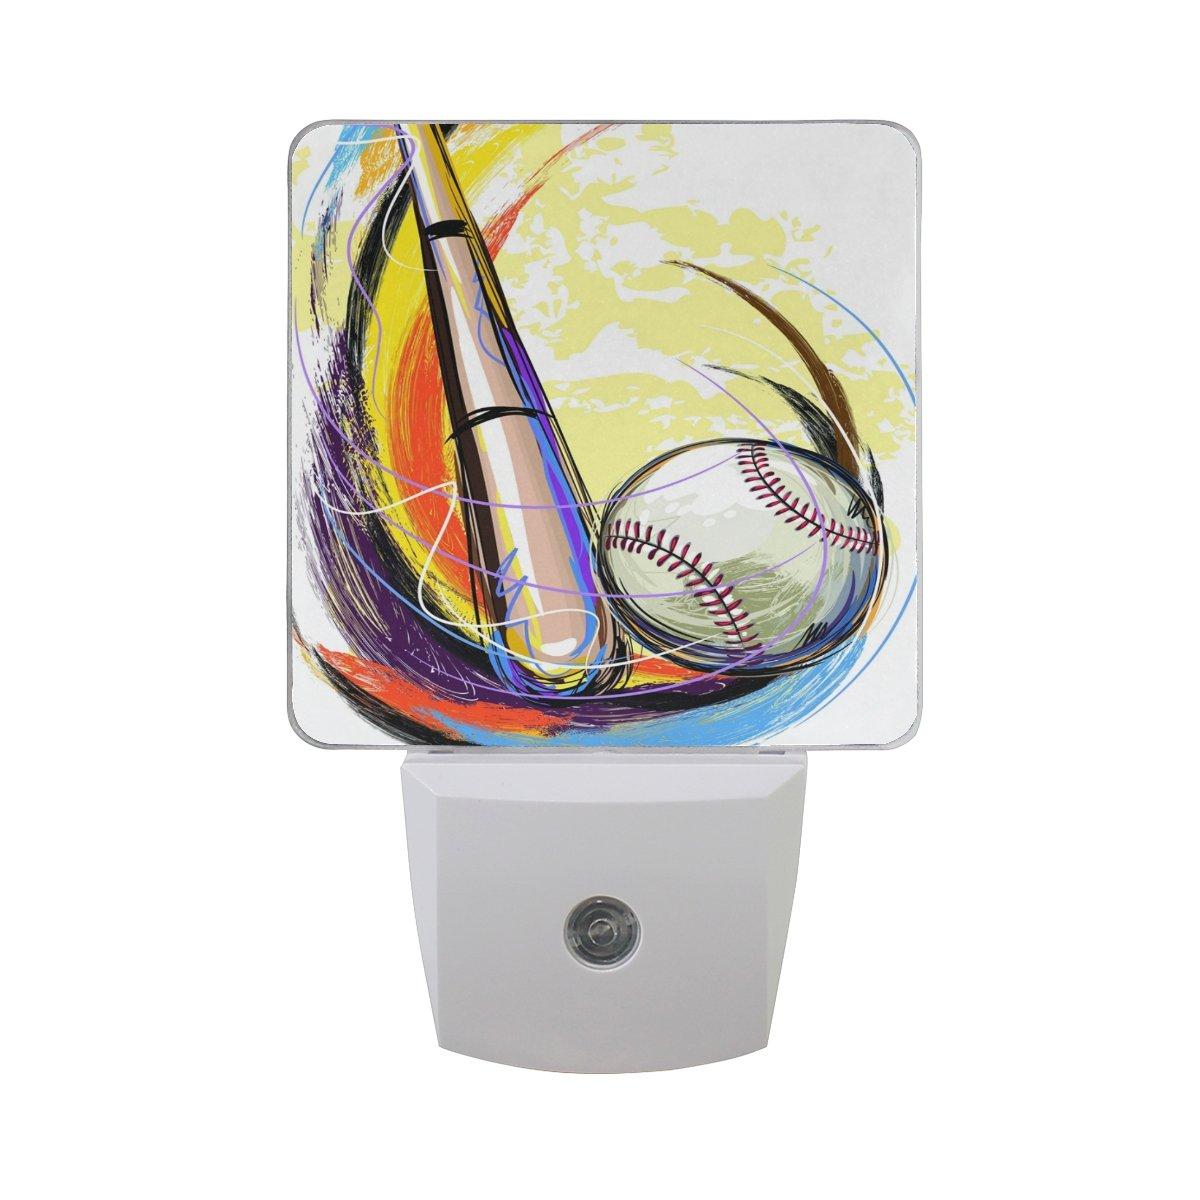 Baseball Bat Painting White LED Sensor Night Light Super Bright Power Dusk To Dawn Sensor Bedroom Kitchen Bathroom Hallway Toilet Stairs Energy Efficient Compact(2 PACK)